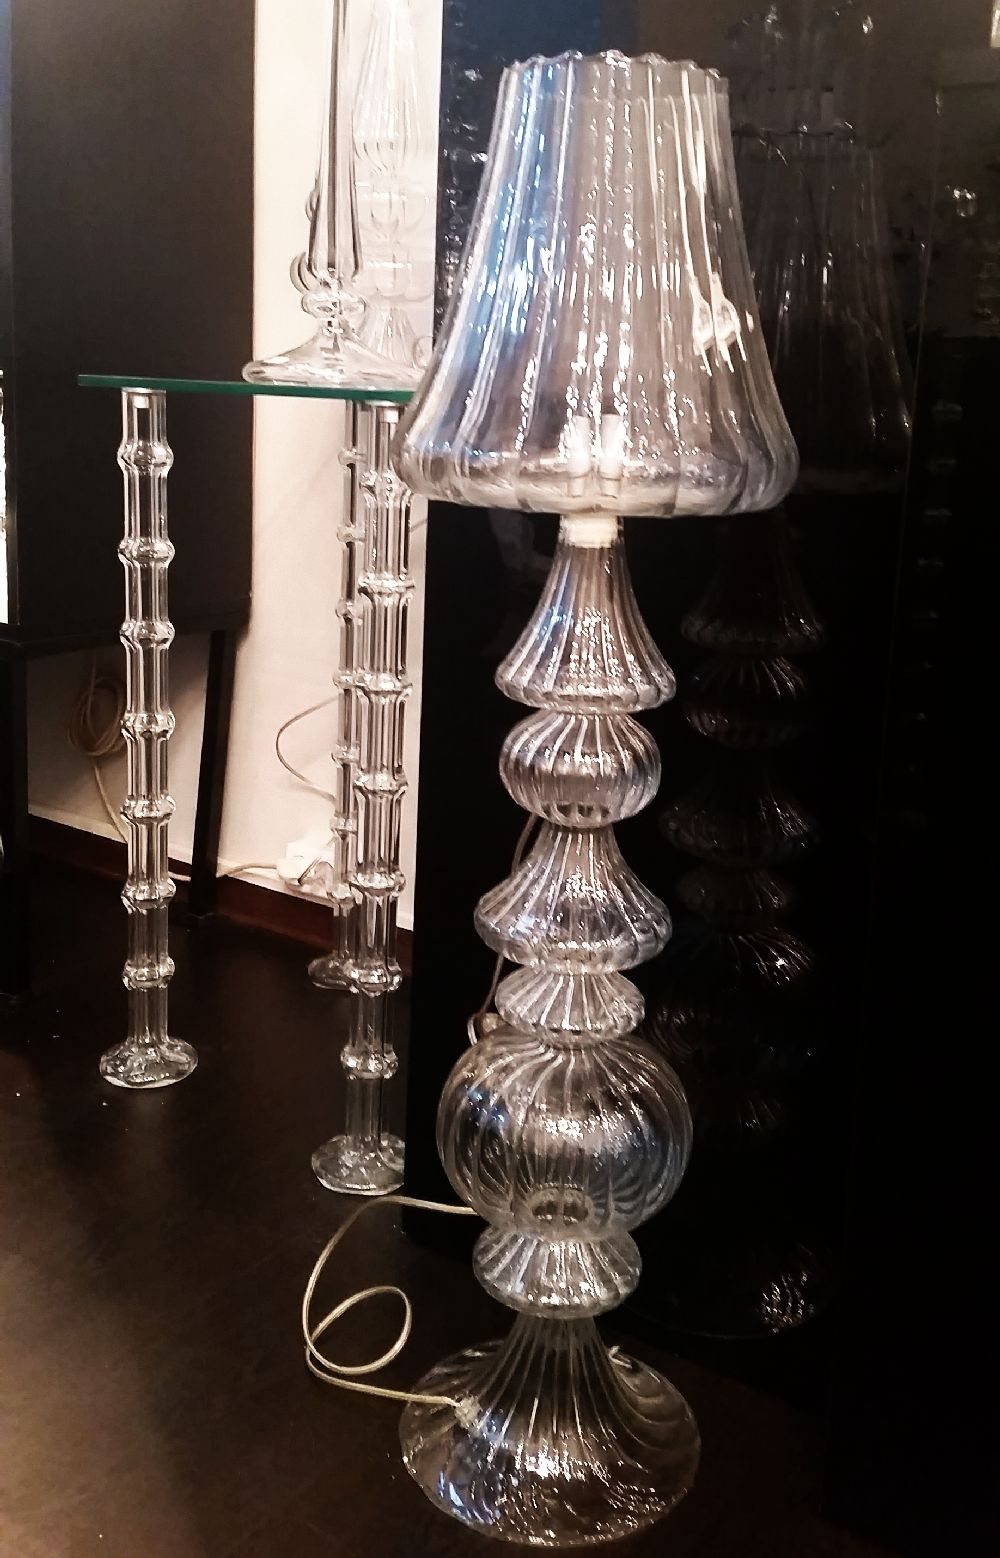 adelaparvu.com despre atelierul de sticlarie Gabriela Seres (20)